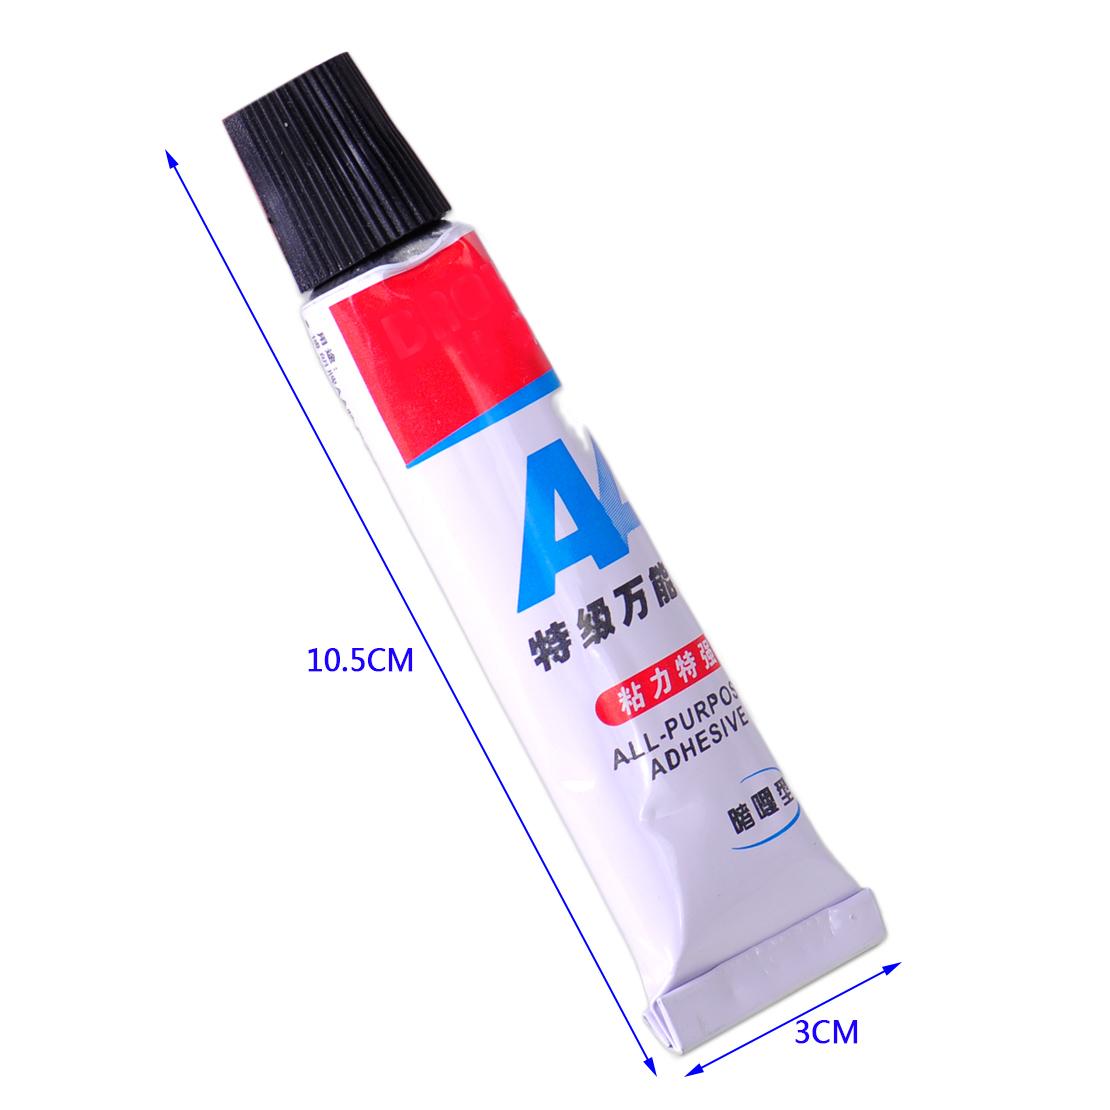 20ml Super Glue All Purpose Adhesive Stick Shoe Repair